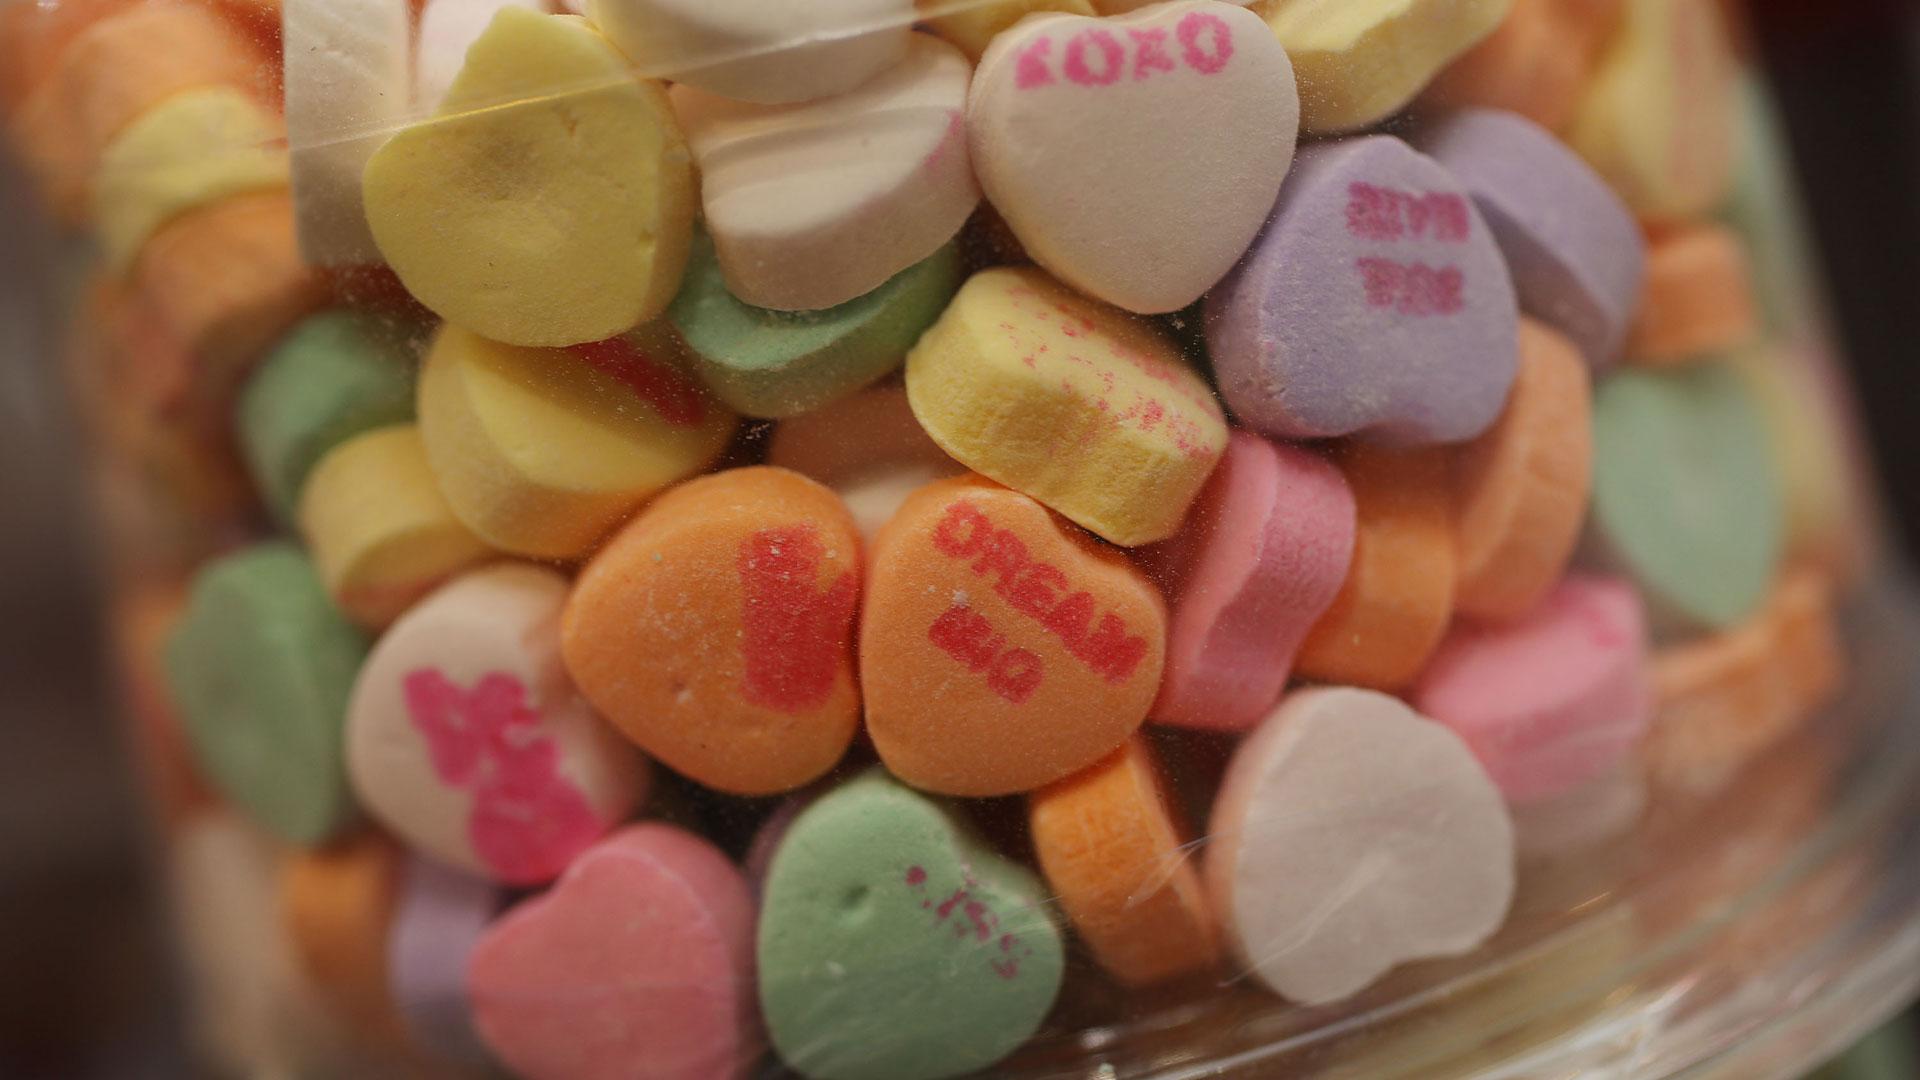 Sweetheart candy hearts